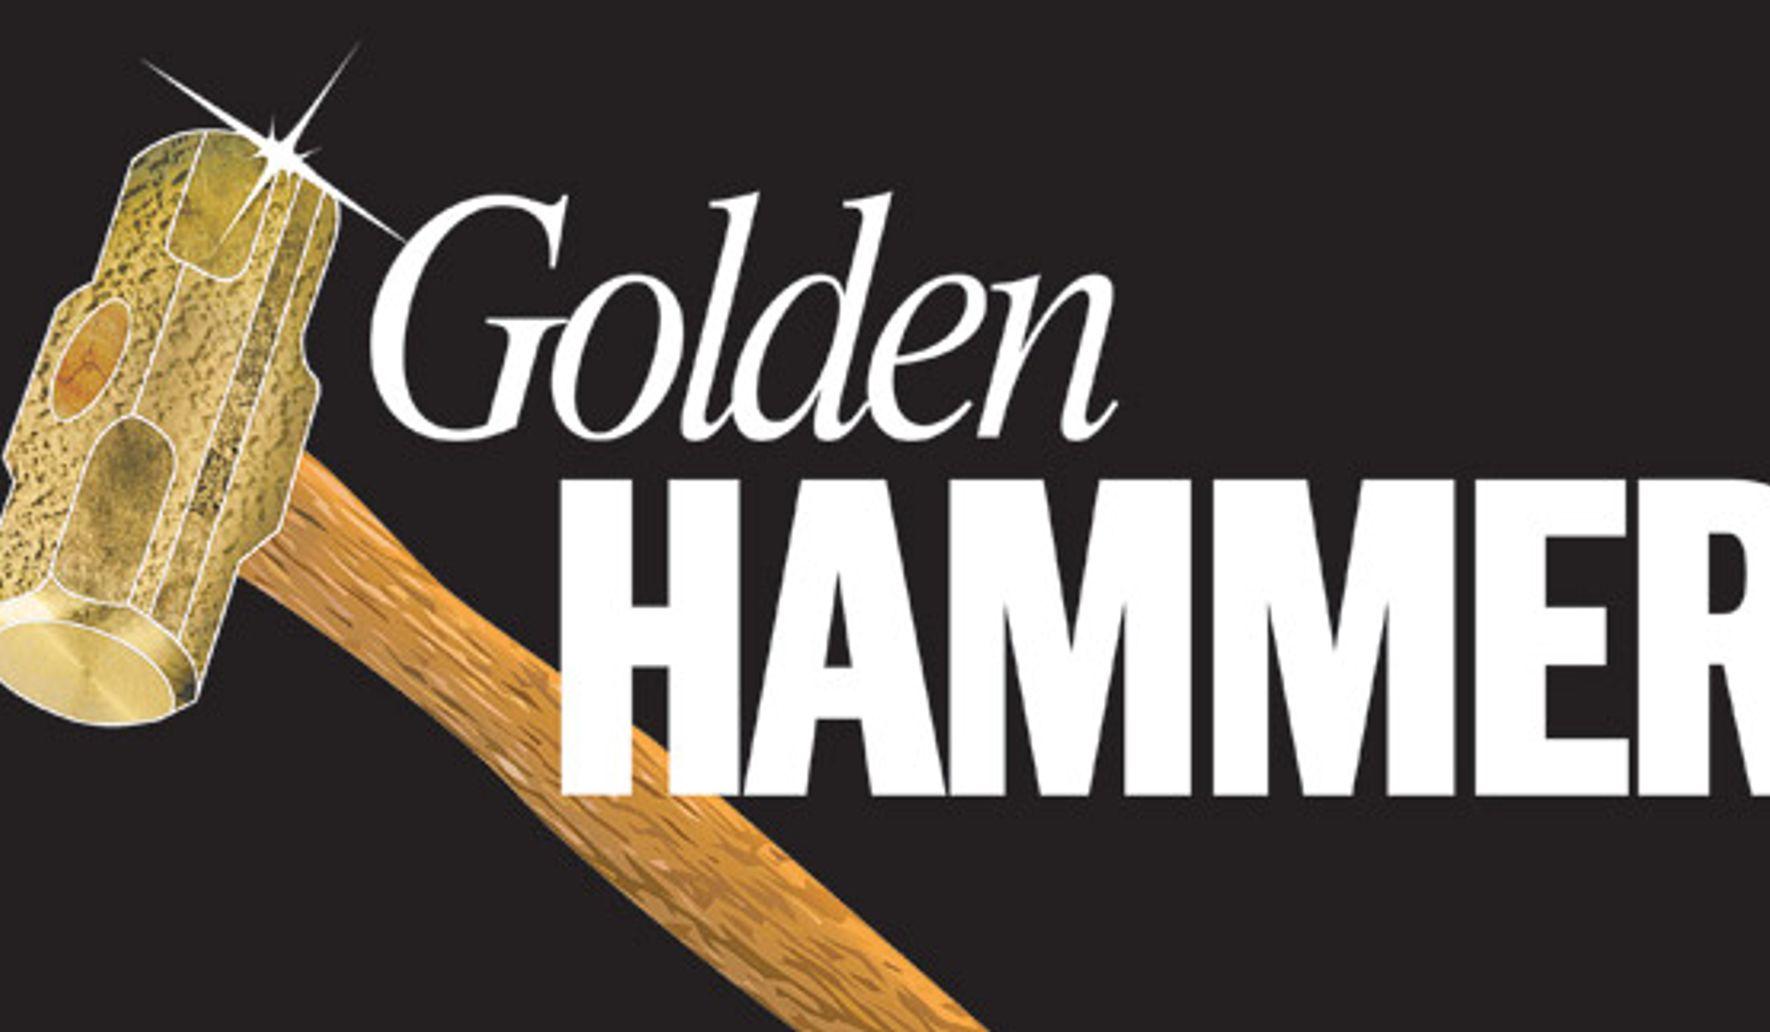 Golden Hammer: Waste, unspent funds found in Navajo jobs program